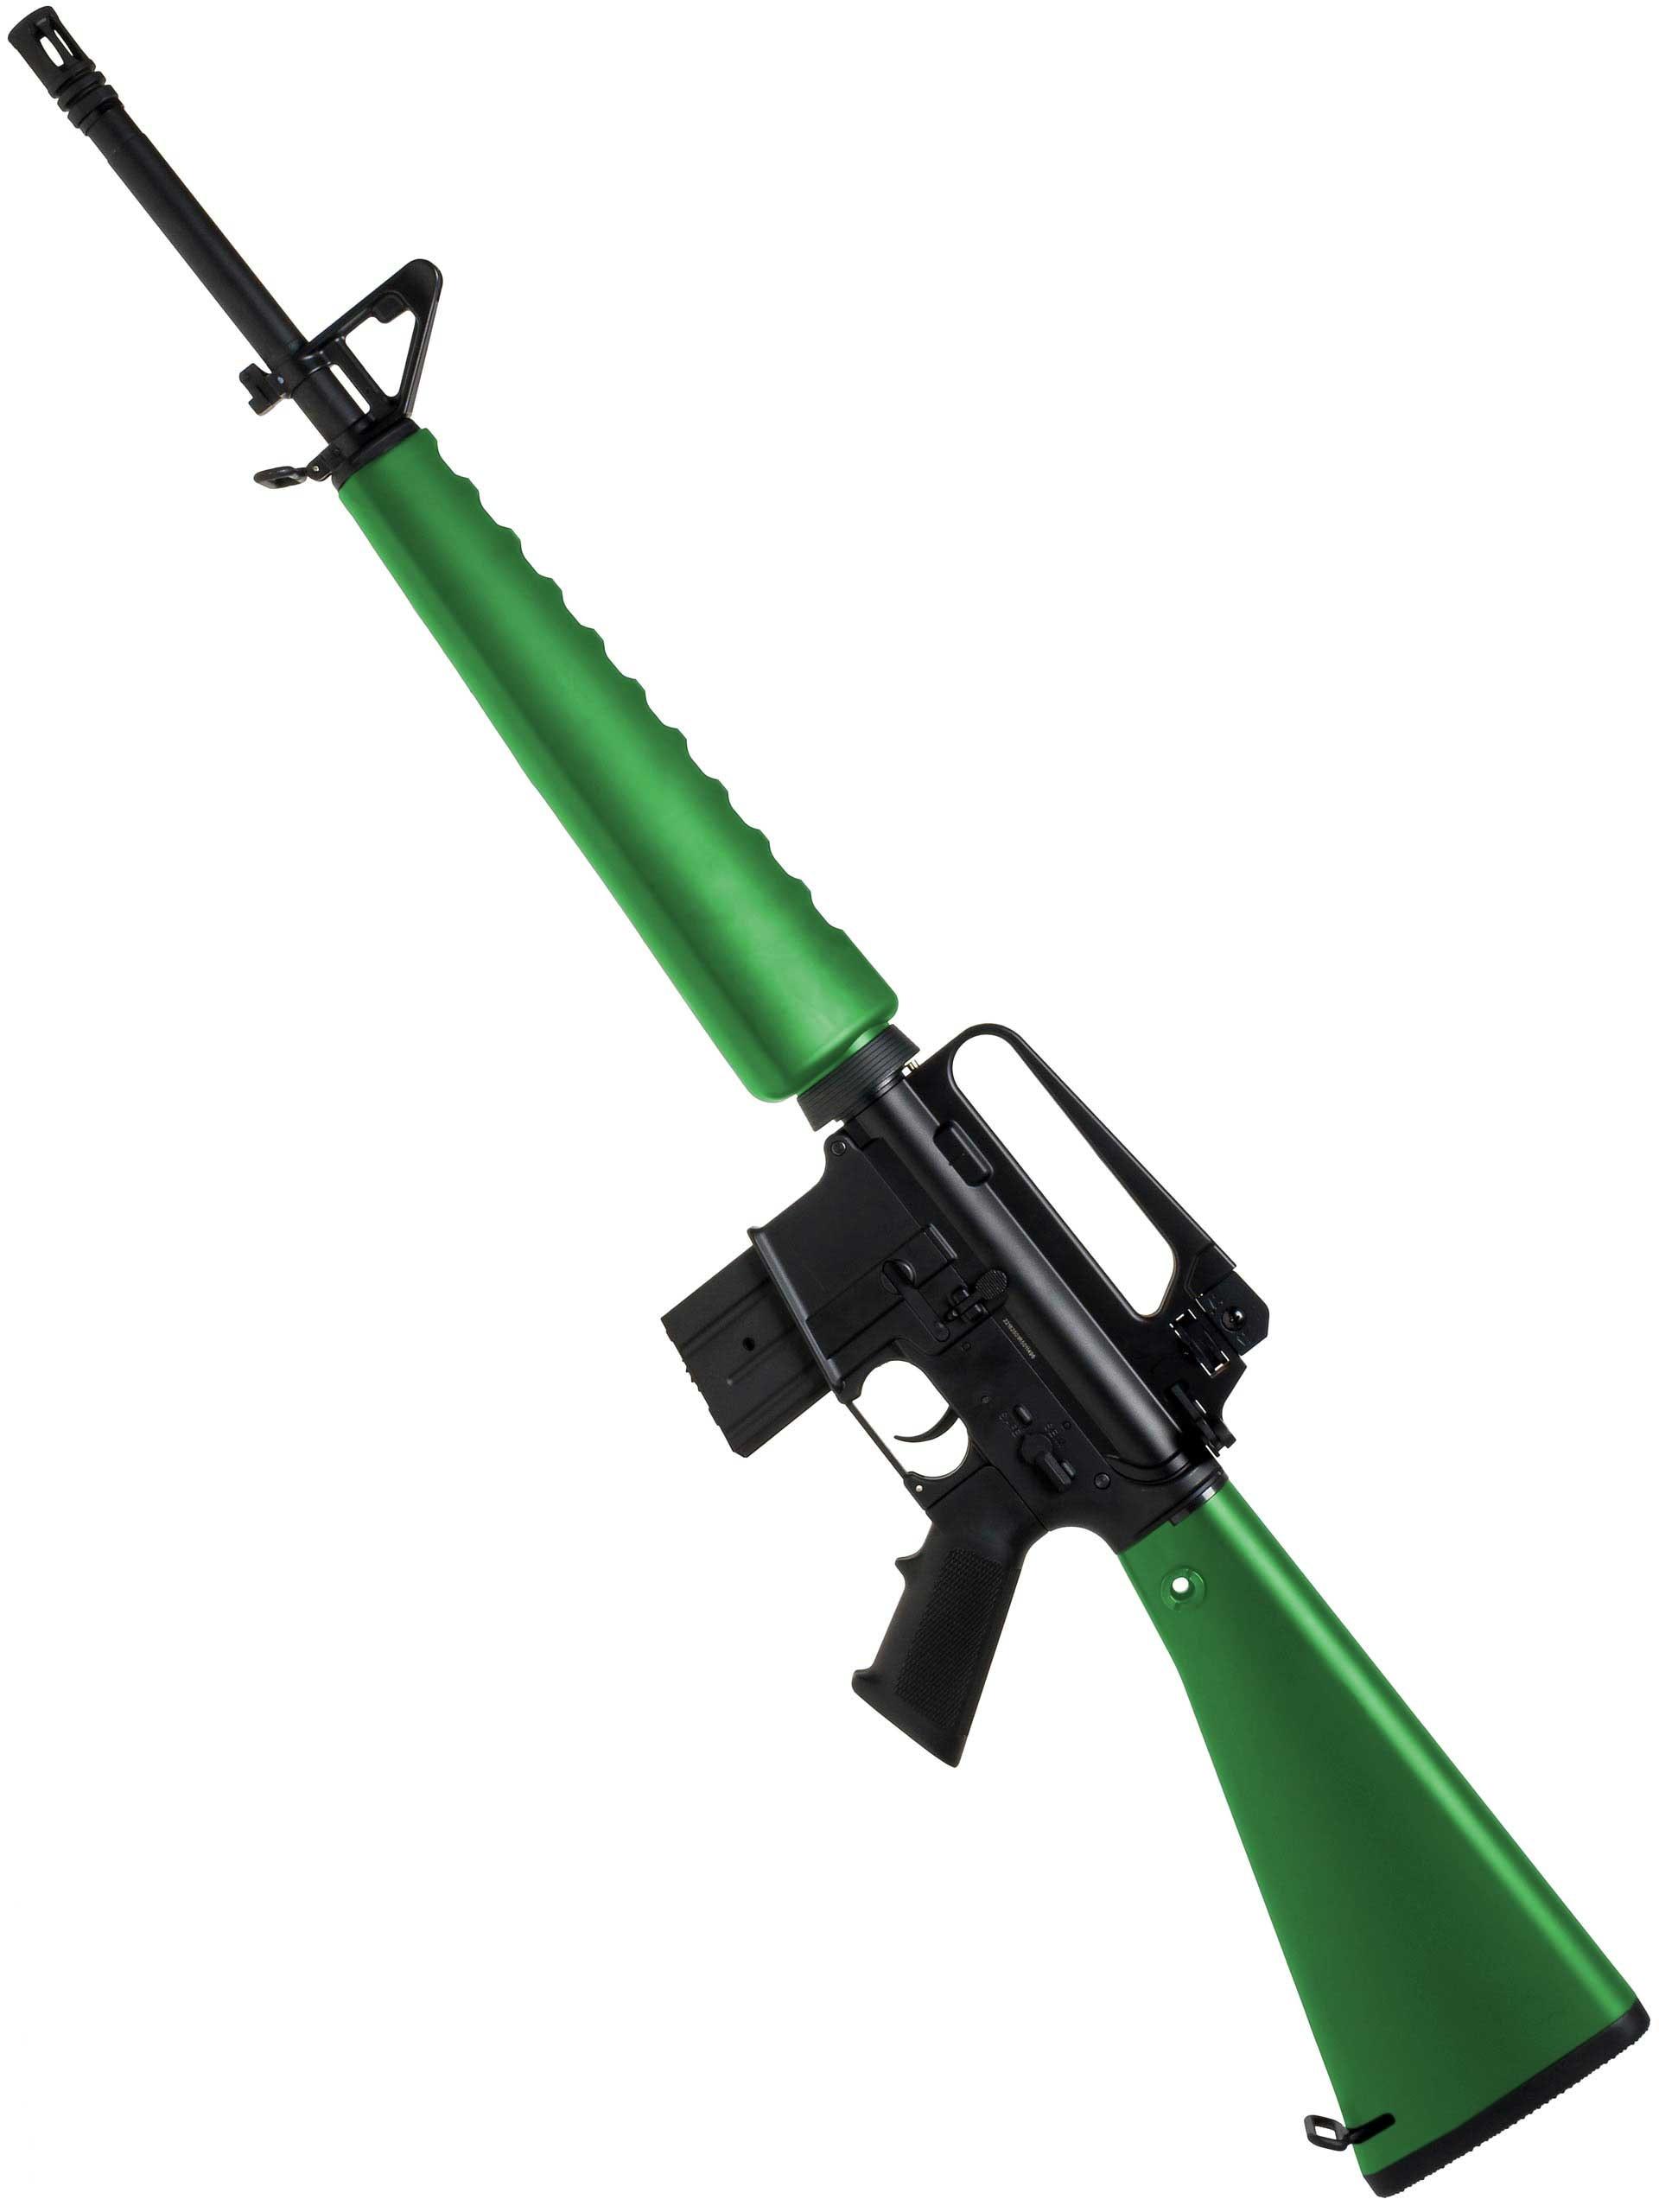 Golden Eagle M16A1 Super Enhanced AEG